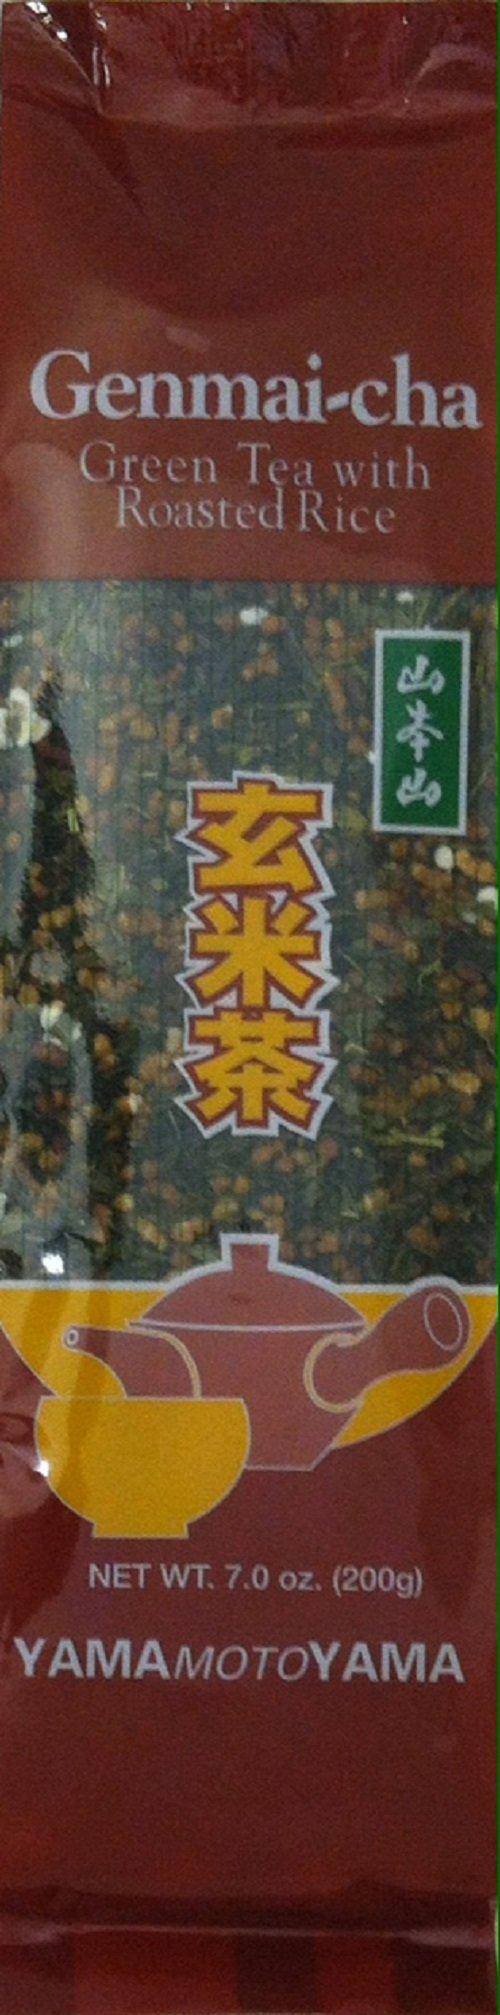 Yamamotoyama Loose Genmai-Cha Green Tea with Roasted Rice, 7.0-Ounce Bags (Pack of 6)